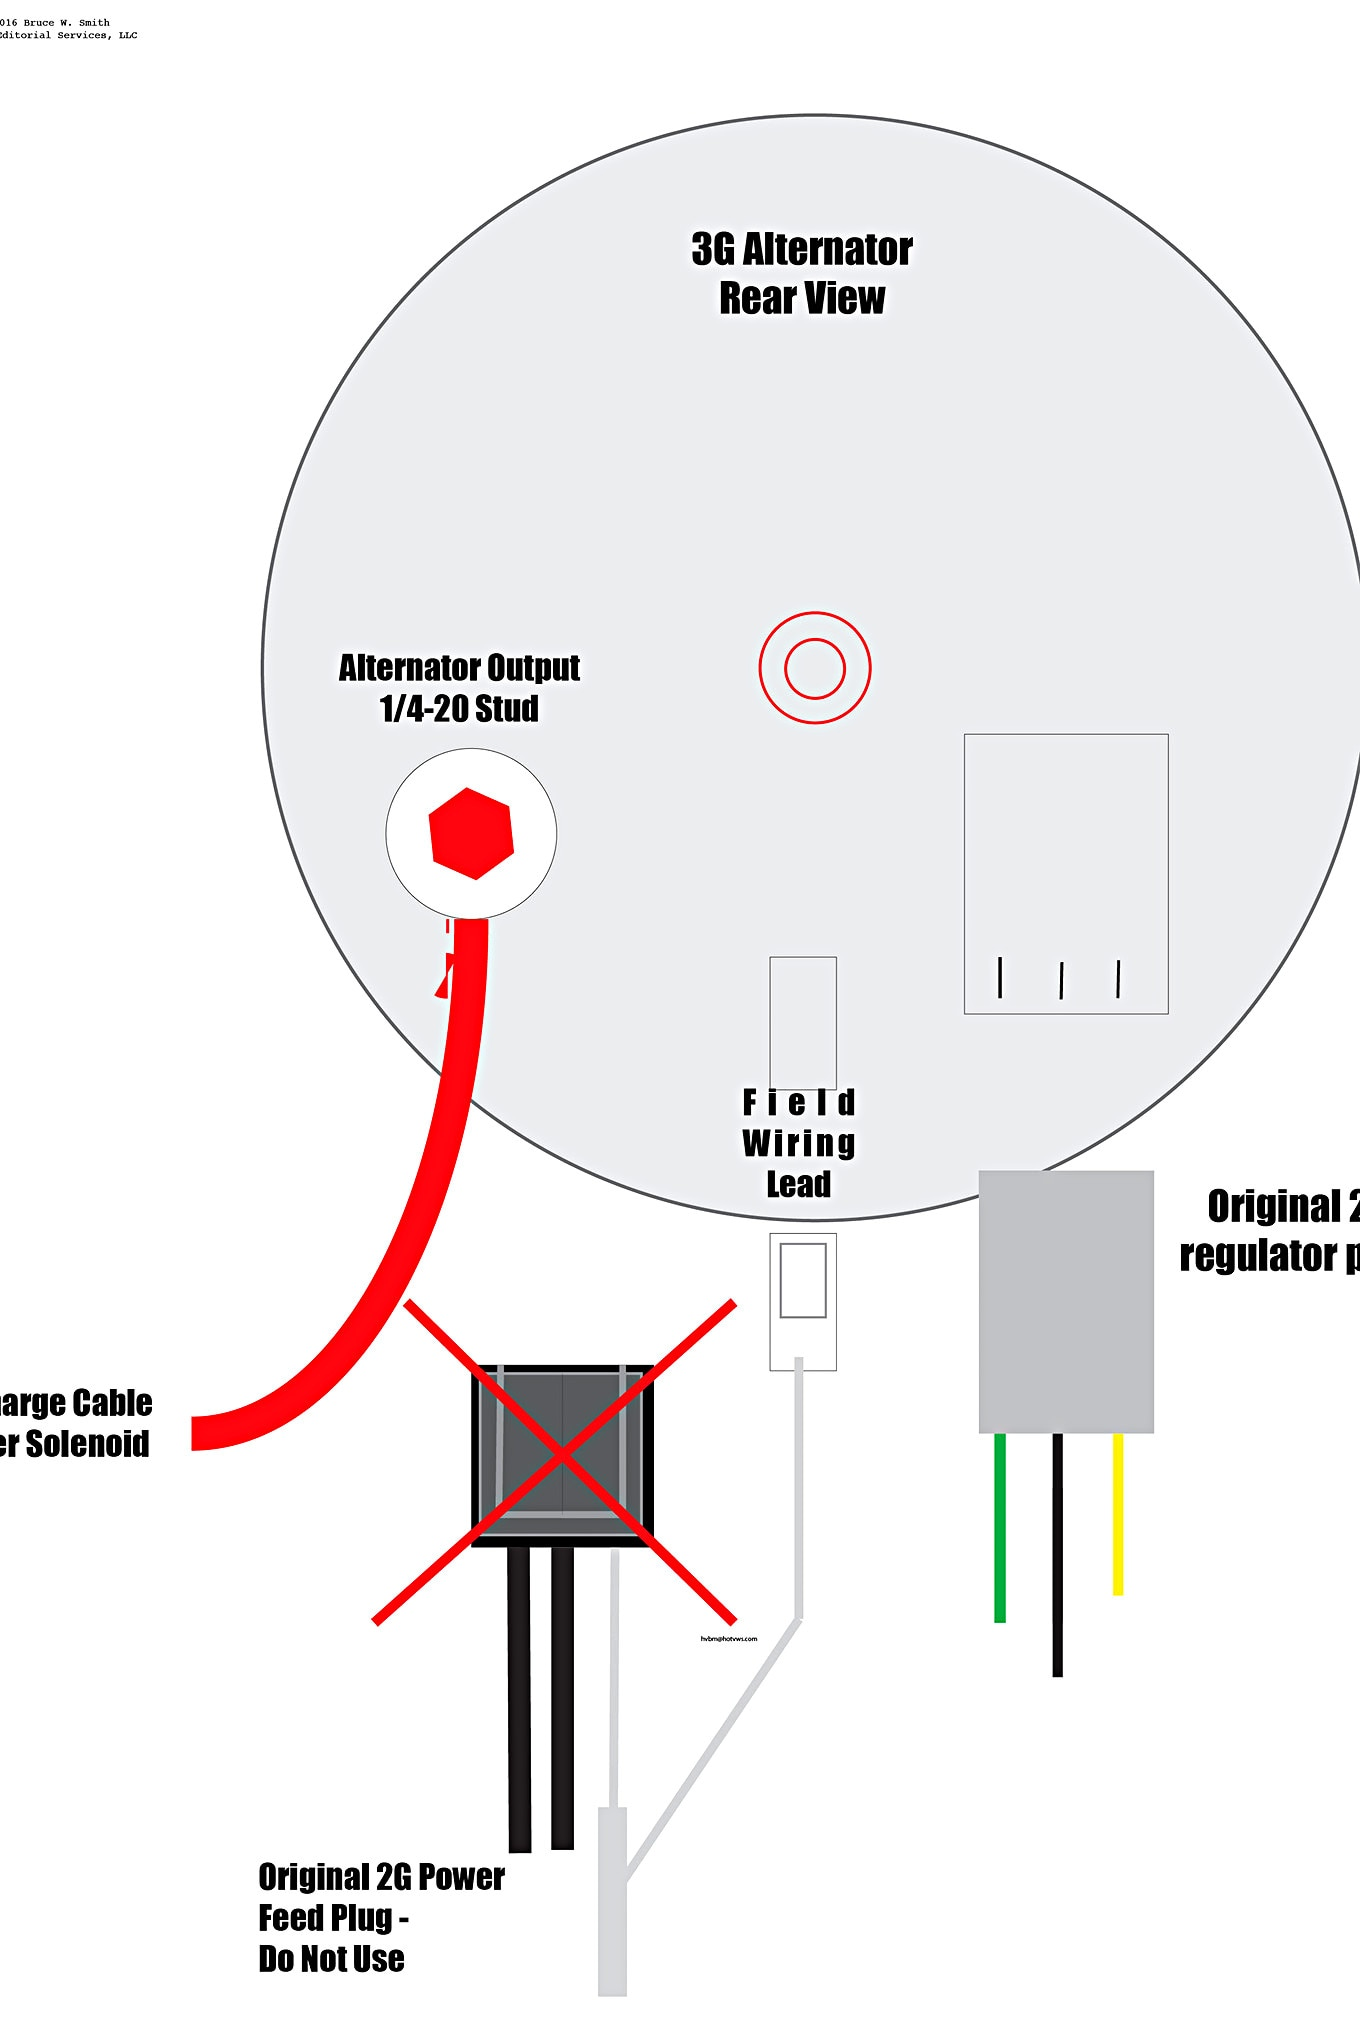 hight resolution of ford 3g alternator wiring wiring diagram meta ford 3g alternator wiring harness ford 3g alternator wiring